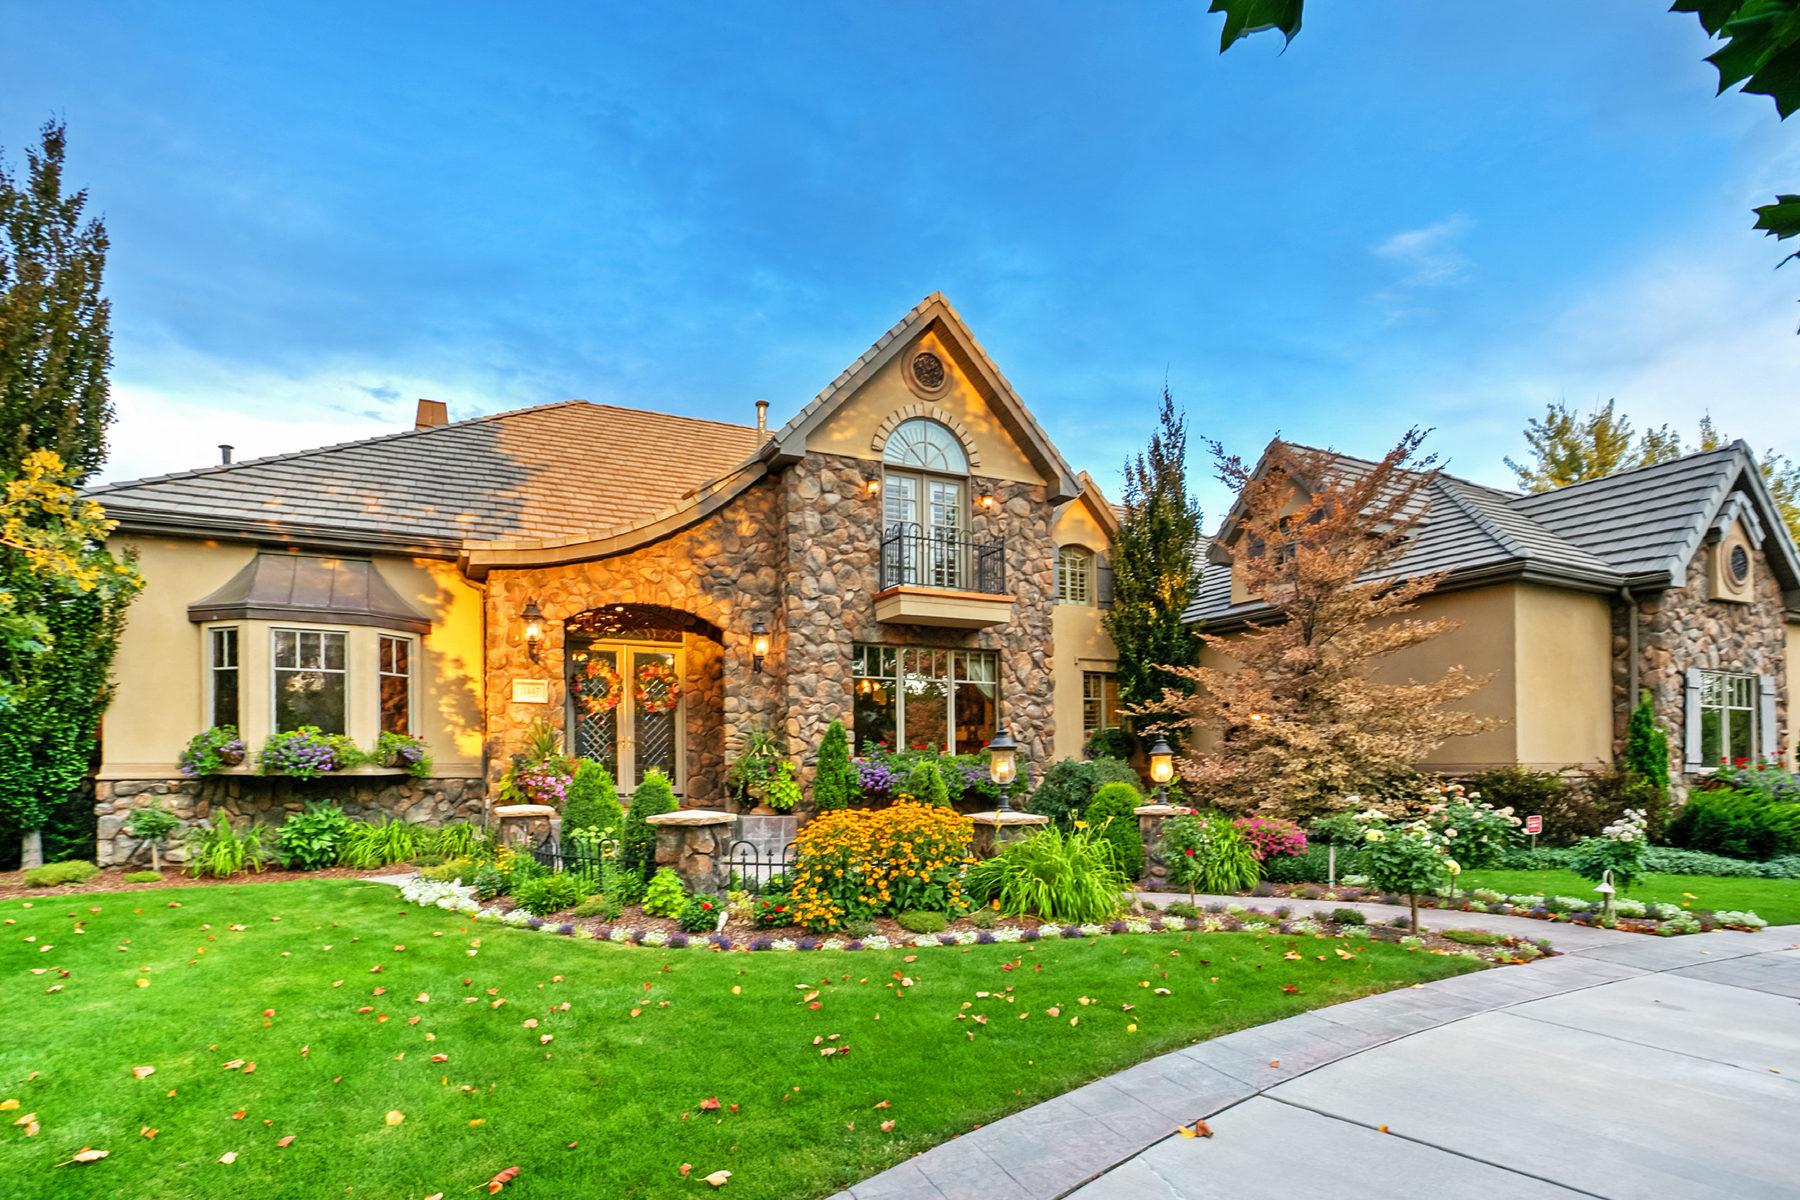 独户住宅 为 销售 在 Quintessential Country Estate 11447 S Polo Club Ct 南约旦, 犹他州, 84095 美国